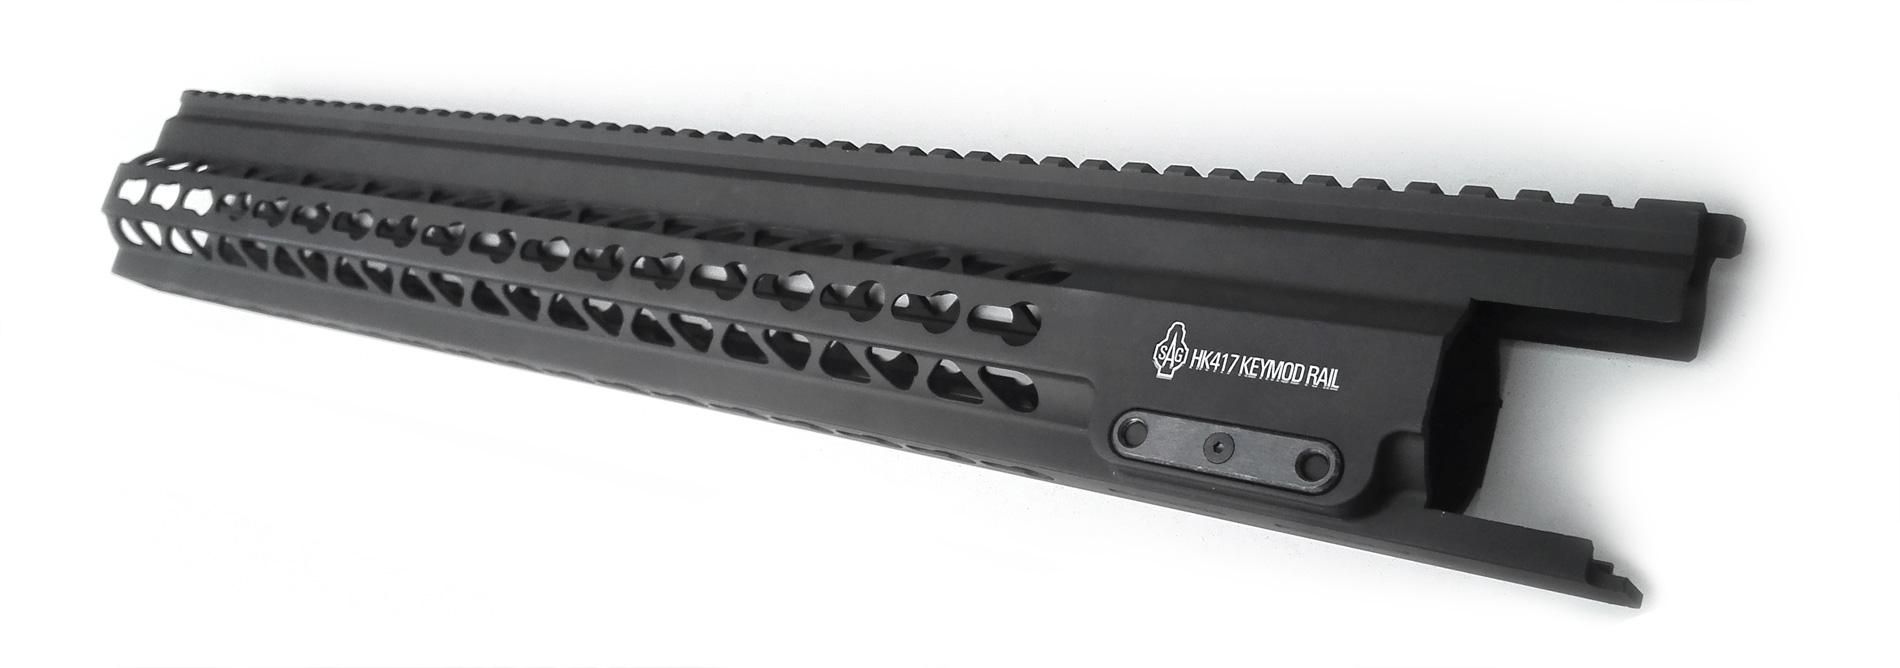 HK417 handguard by SAG